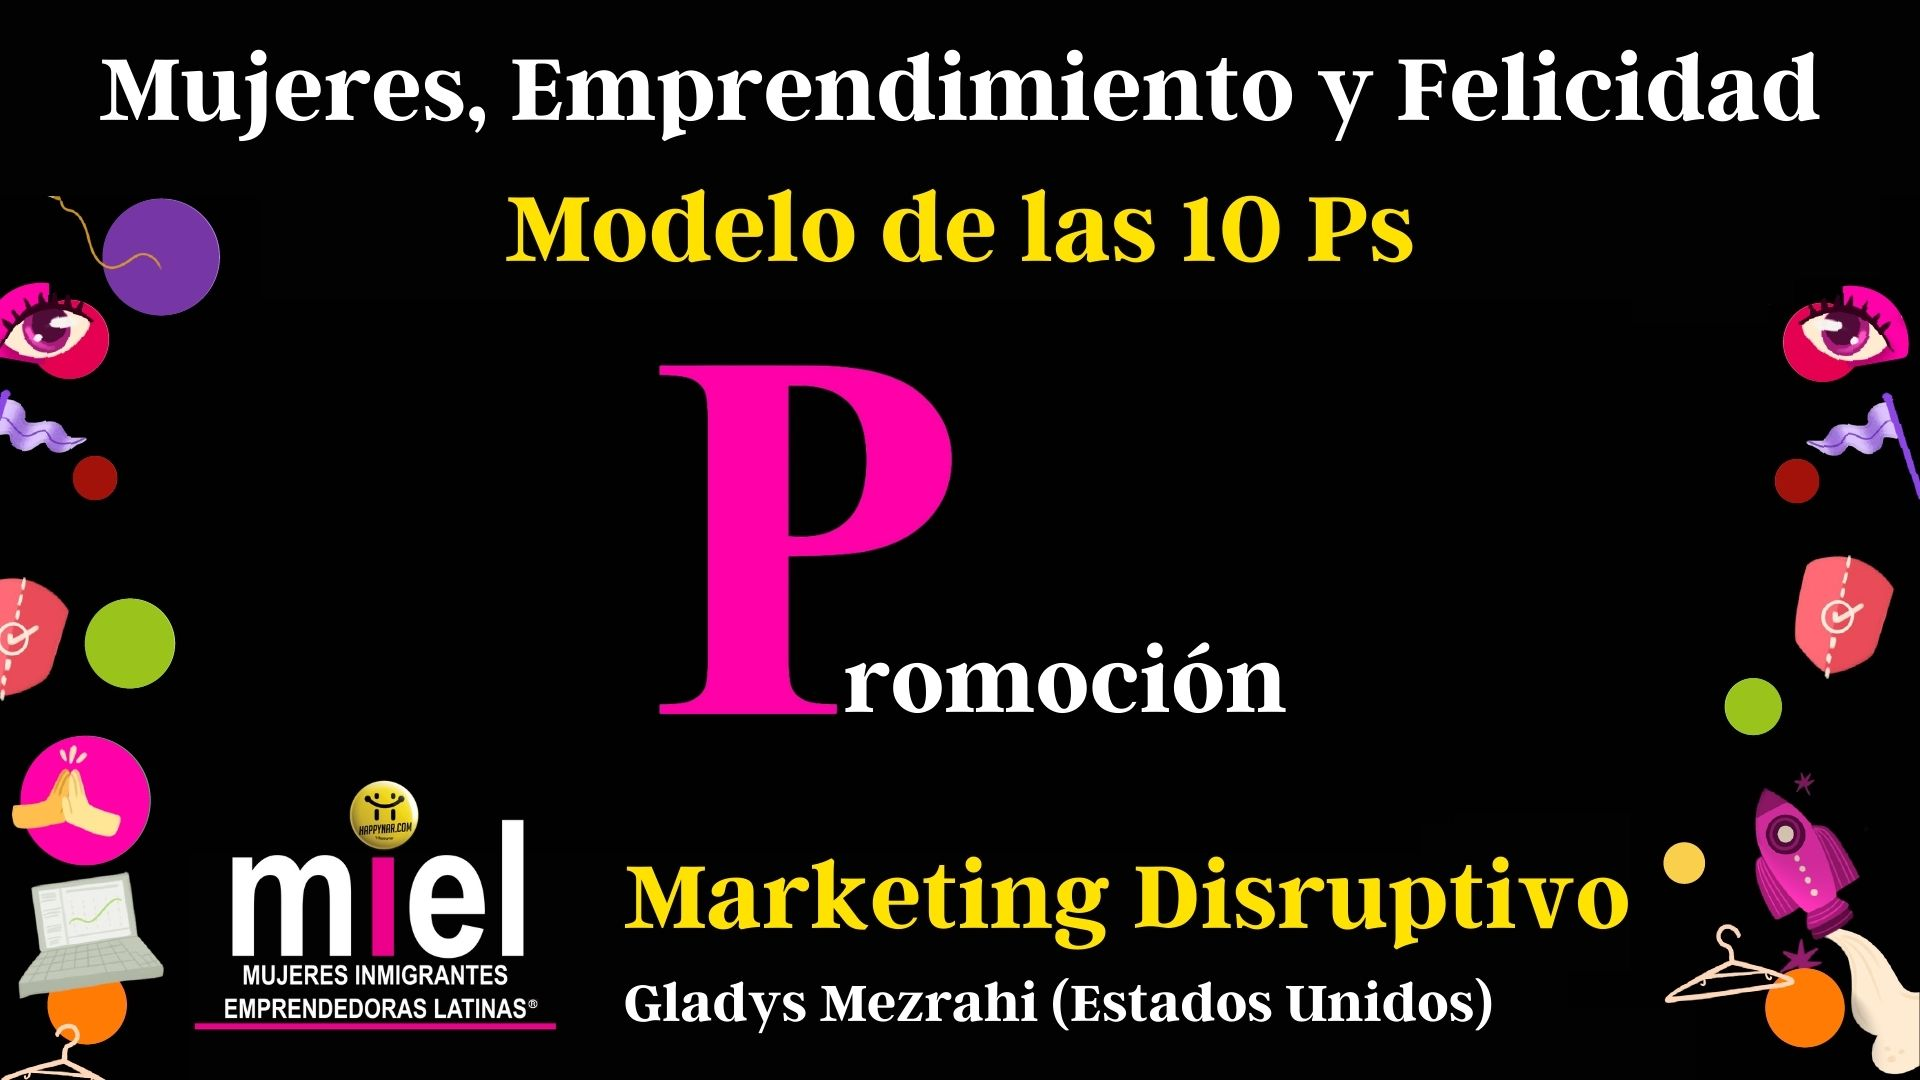 Marketing Disruptivo